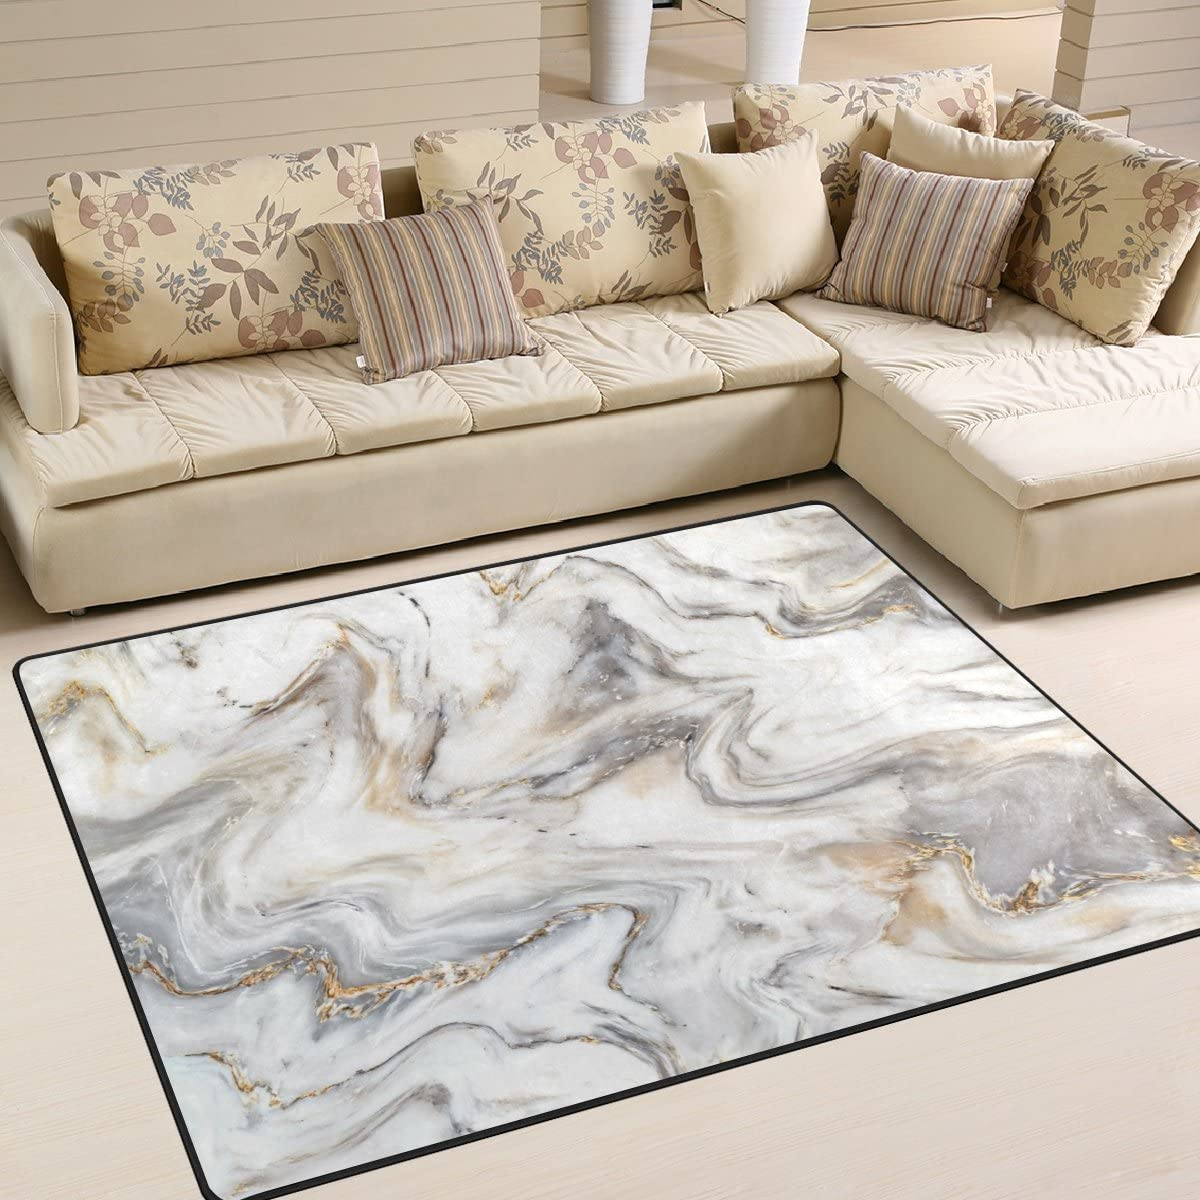 Abstract Marble Nursery Rug Floor Carpet Yoga Mat 1.7 x 2.6 ft Naanle Marble Non Slip Area Rug for Living Dinning Room Bedroom Kitchen 50 x 80 cm